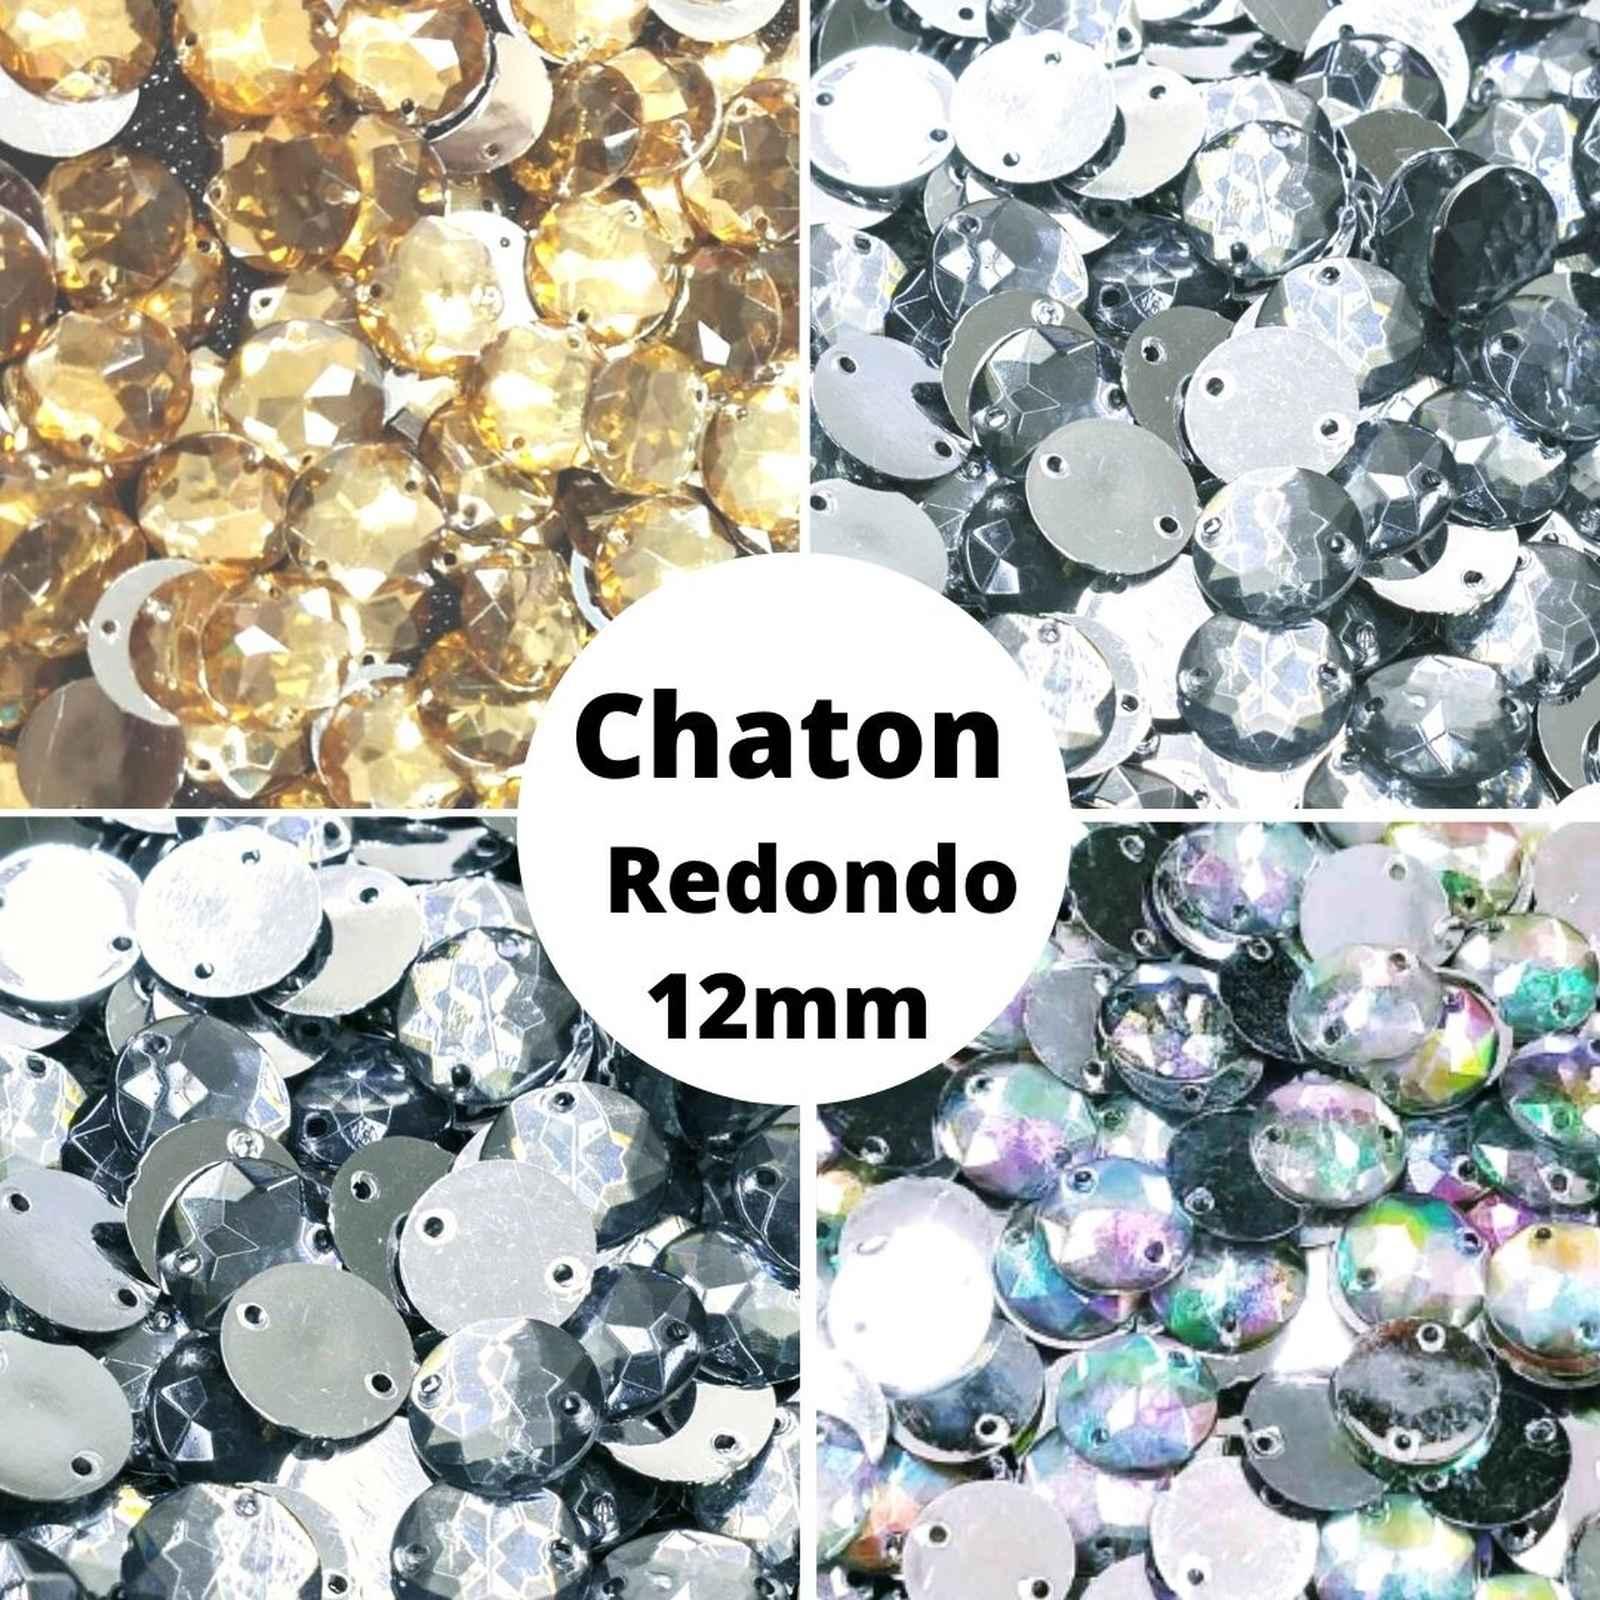 Chaton Redondo Acrilico - 12,0mm - Pacote com 1.000 unidades